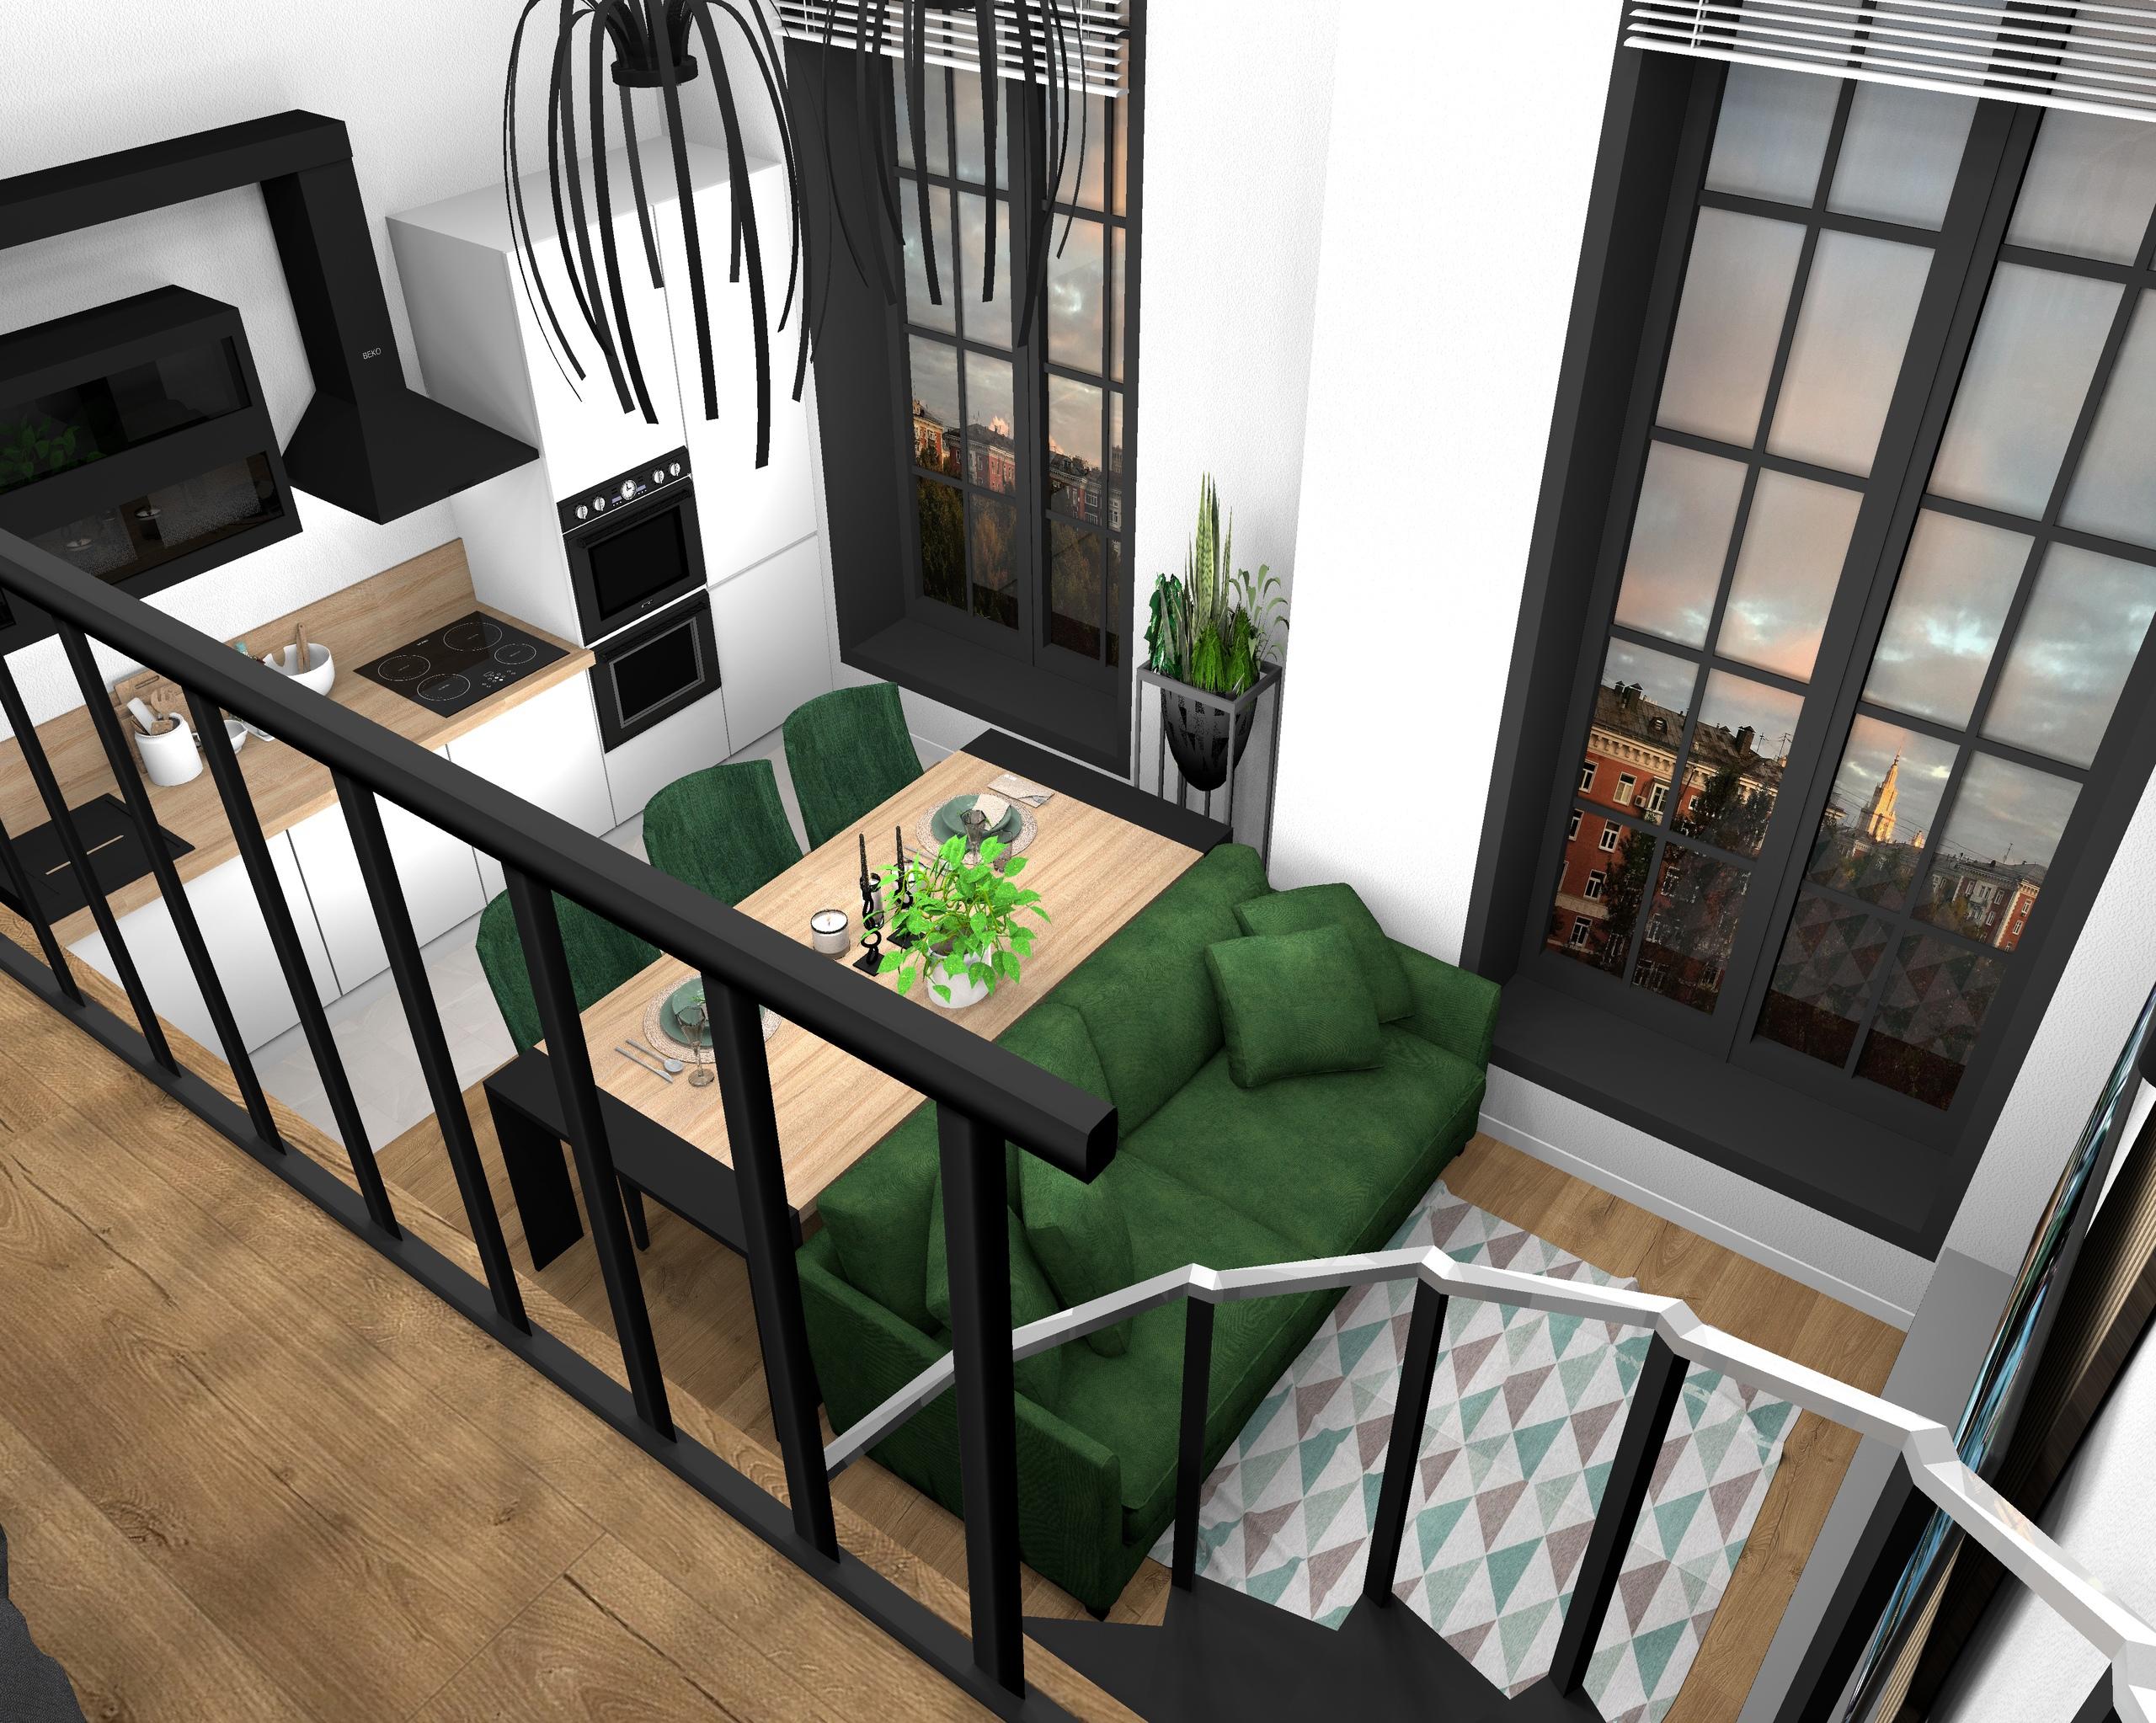 Двухуровневая квартира, площадь первого уровня 33 м2 , площадь второго уровня 14 м2 , высота потолков 4,6 м.